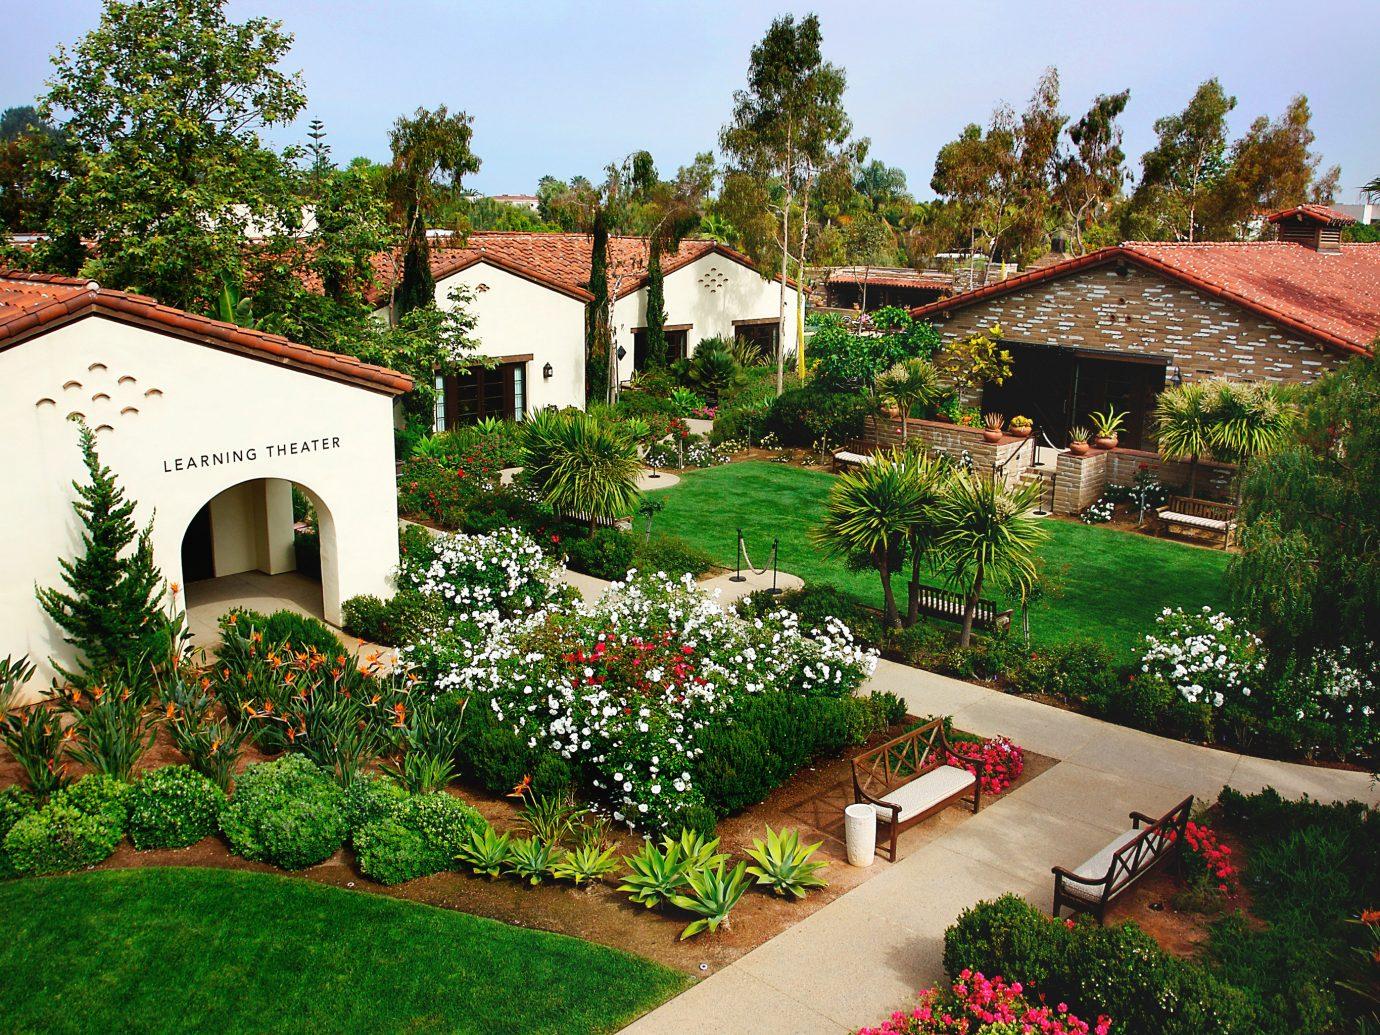 Estancia La Jolla Hotel And Spa - Globel Hotel Alliance - San Diego